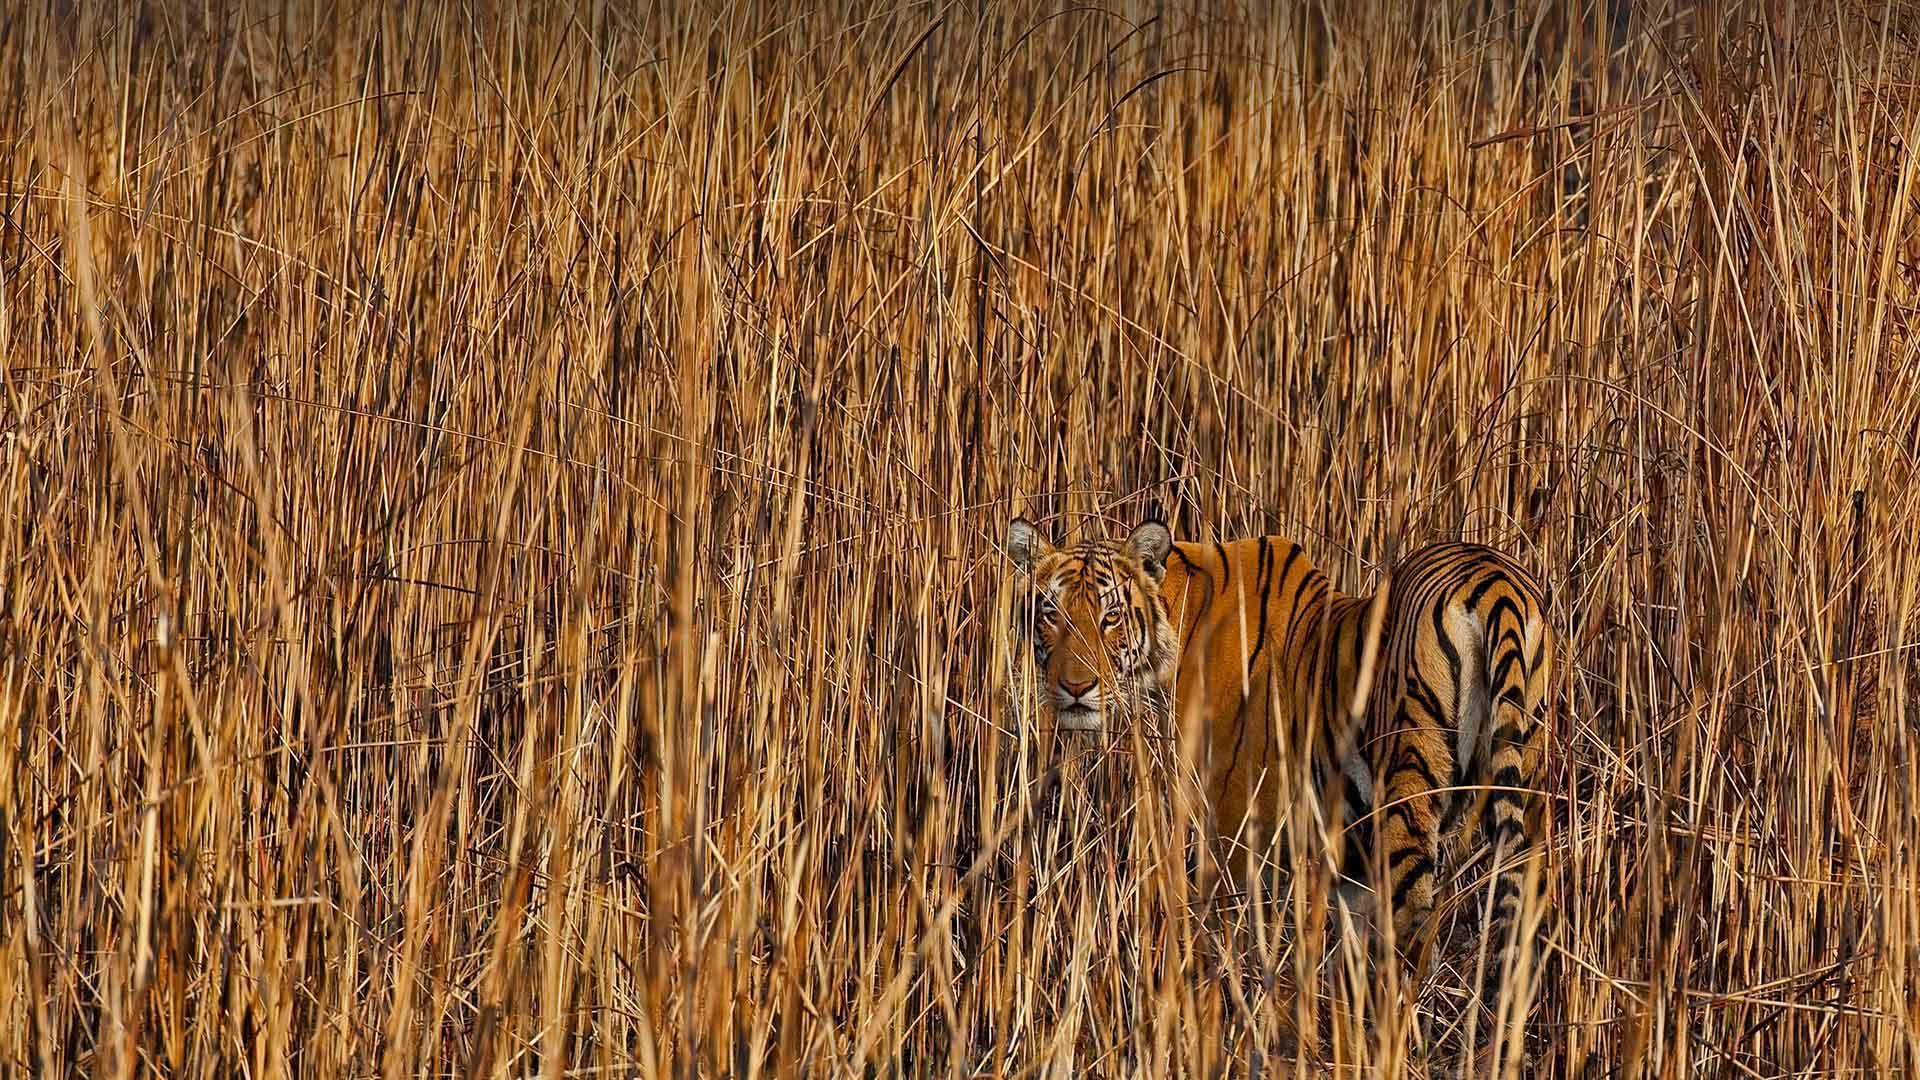 Tiger camouflaged in tall grass, Assam, India (© Sandesh Kadur/Minden Pictures)(Bing United States)